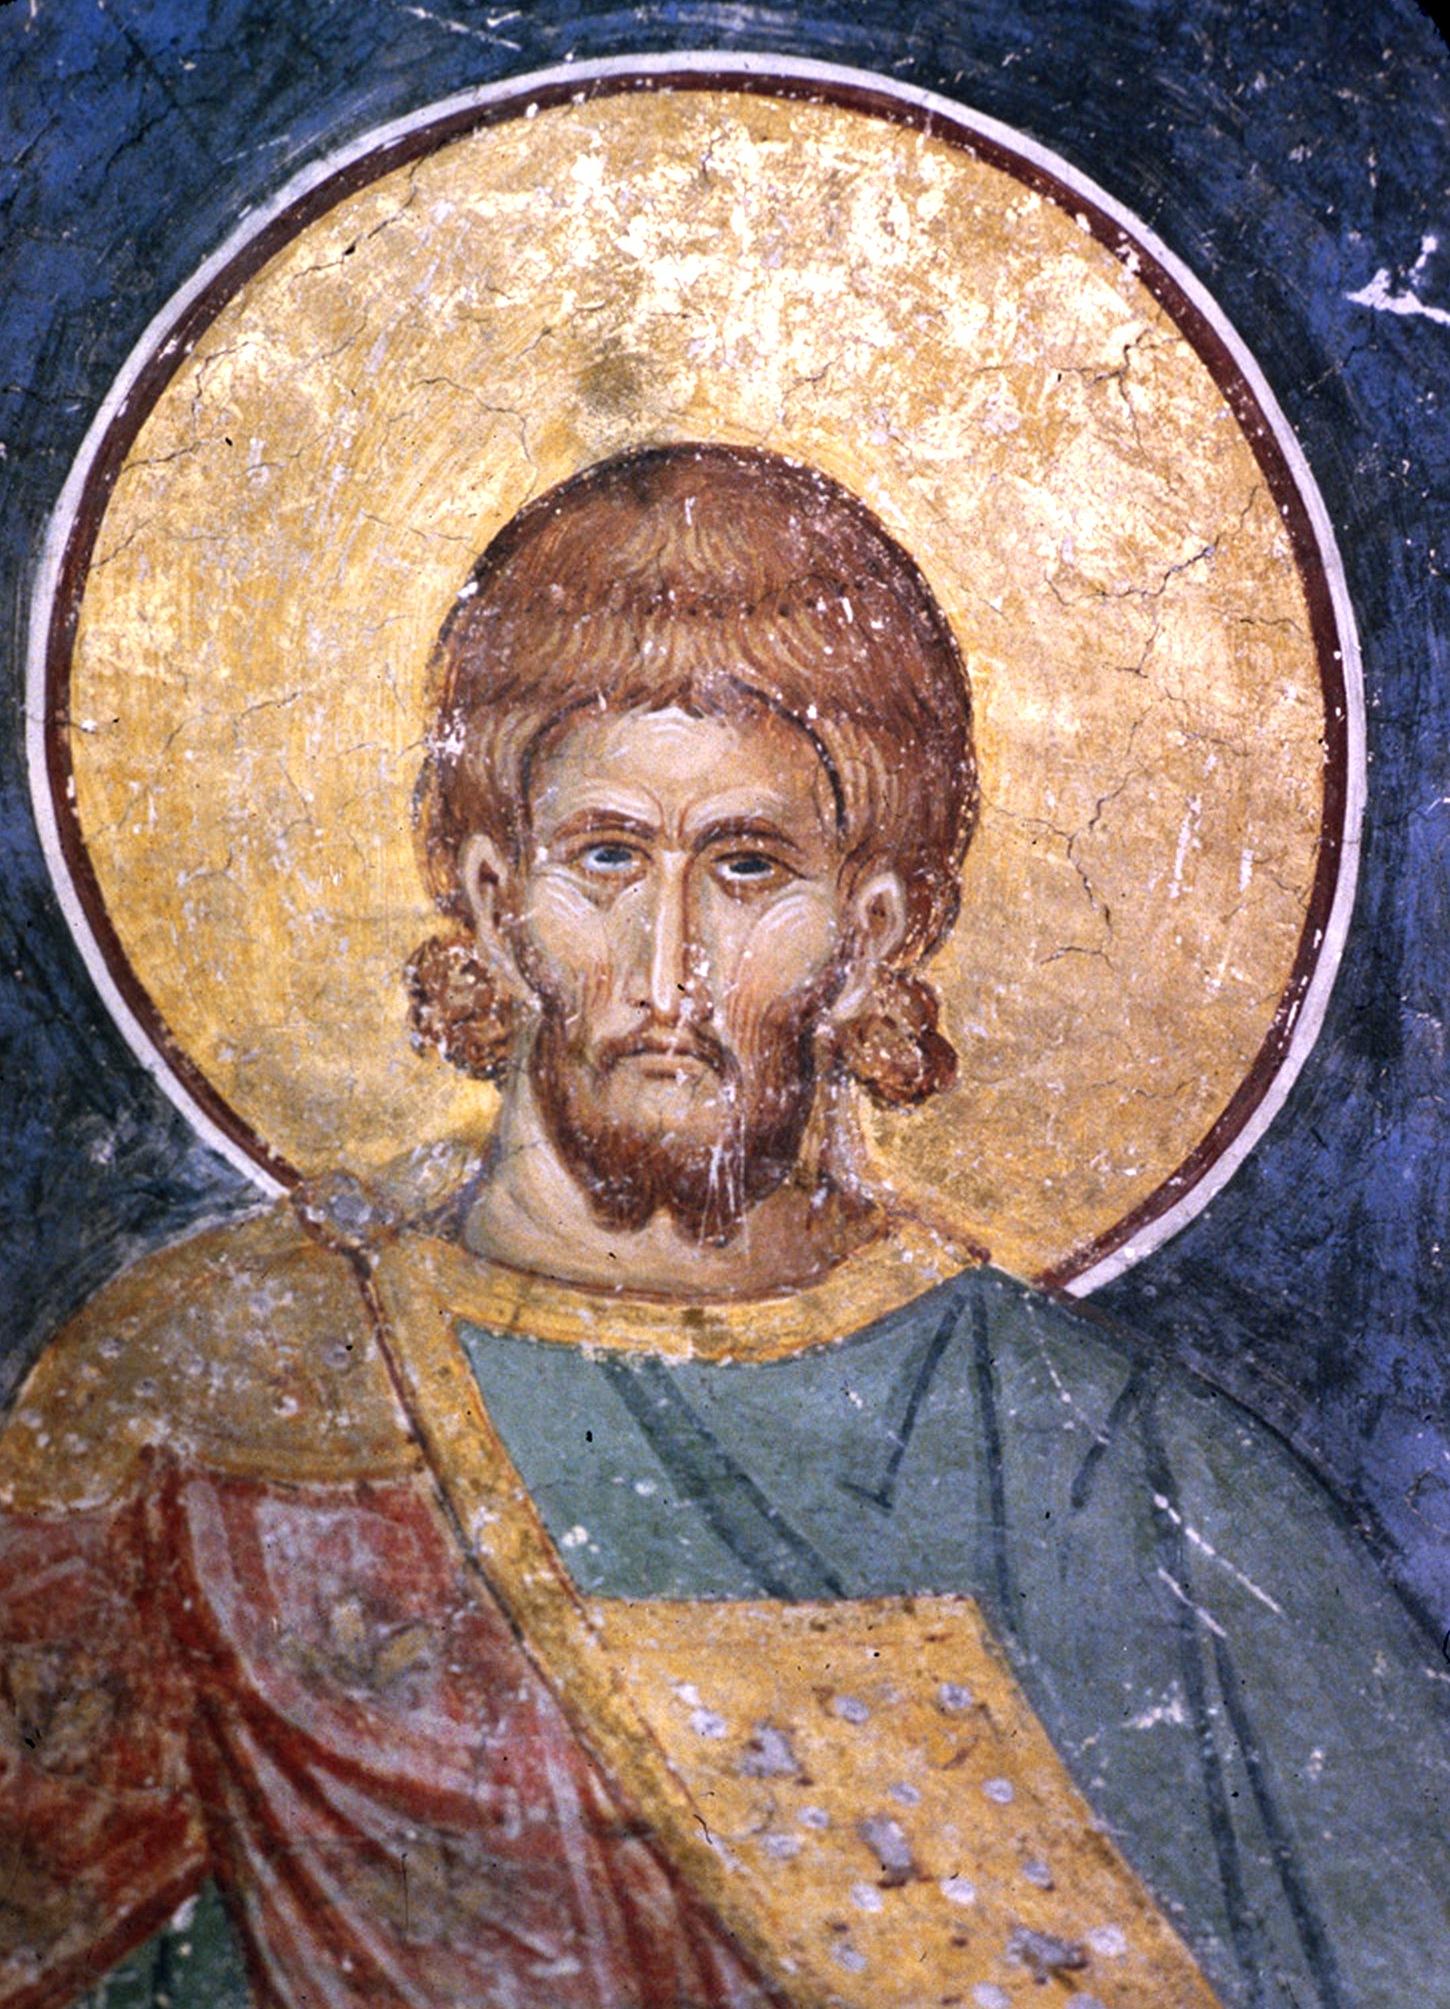 Святой мученик. Фреска монастыря Раваница, Сербия. 1380-е годы.